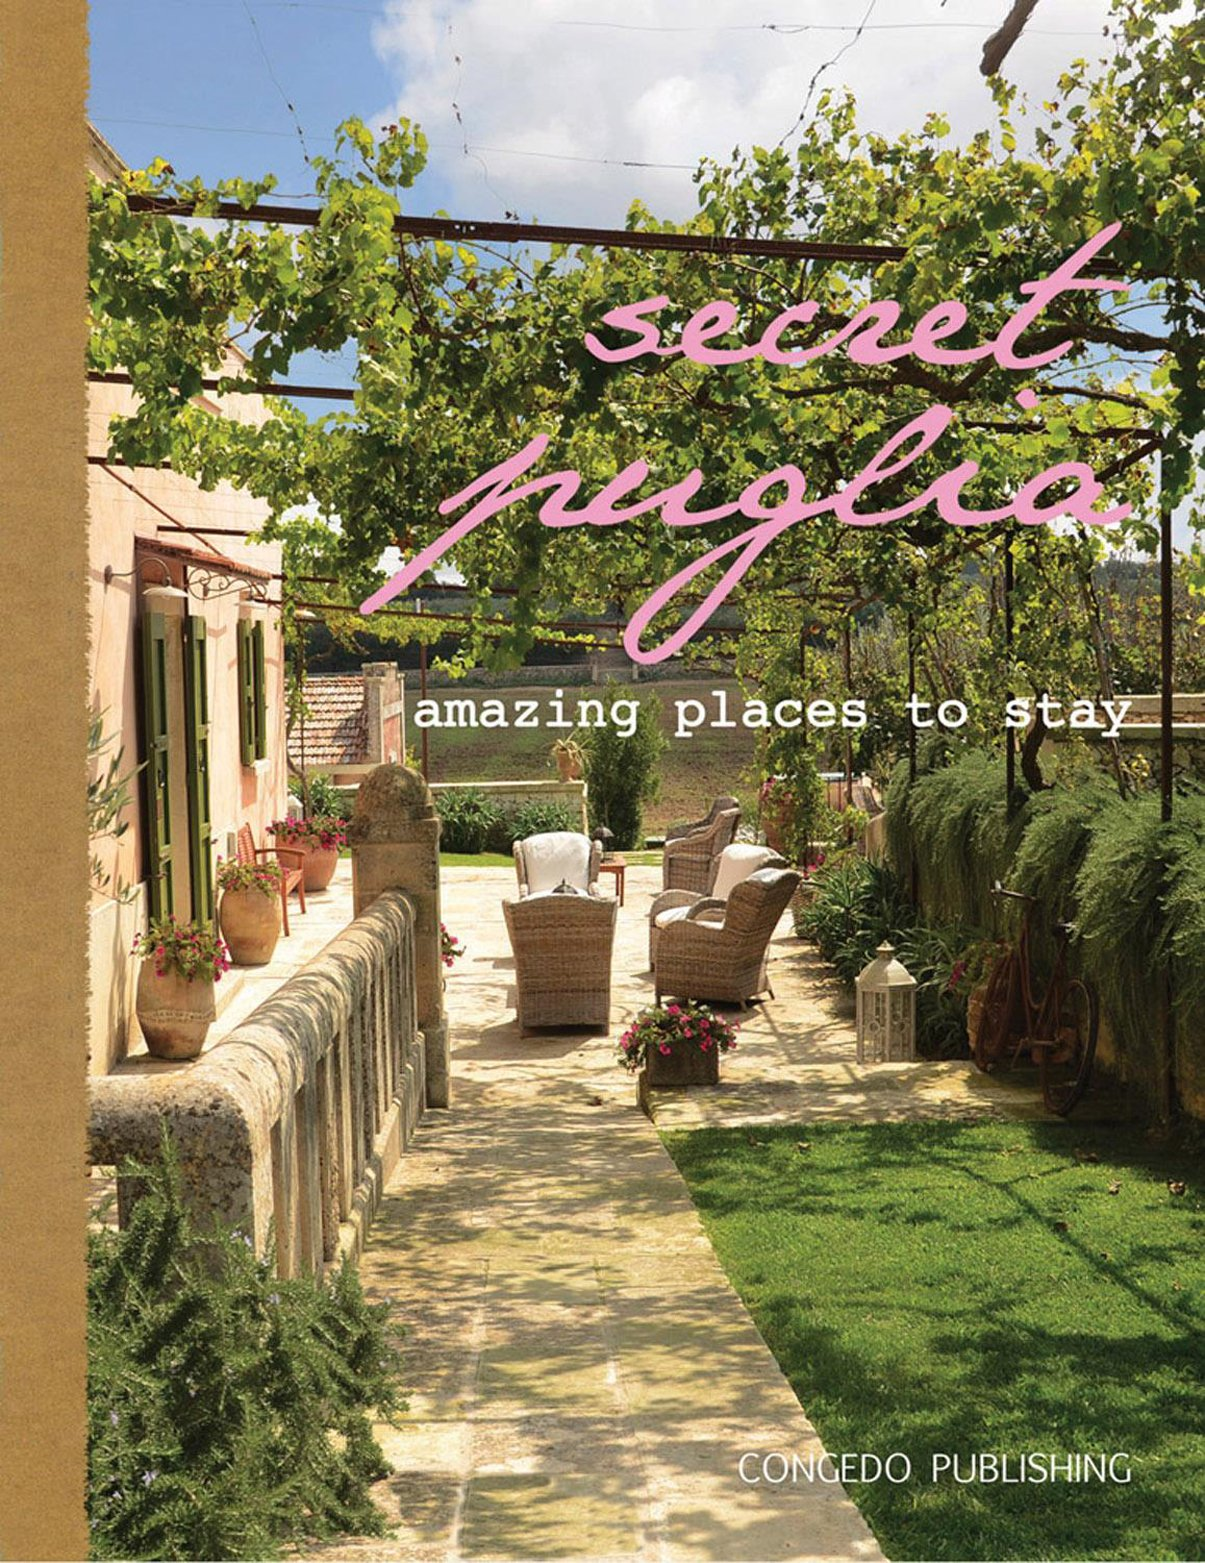 Secret Puglia amazing places to stay. Ediz. italiana e inglese ...